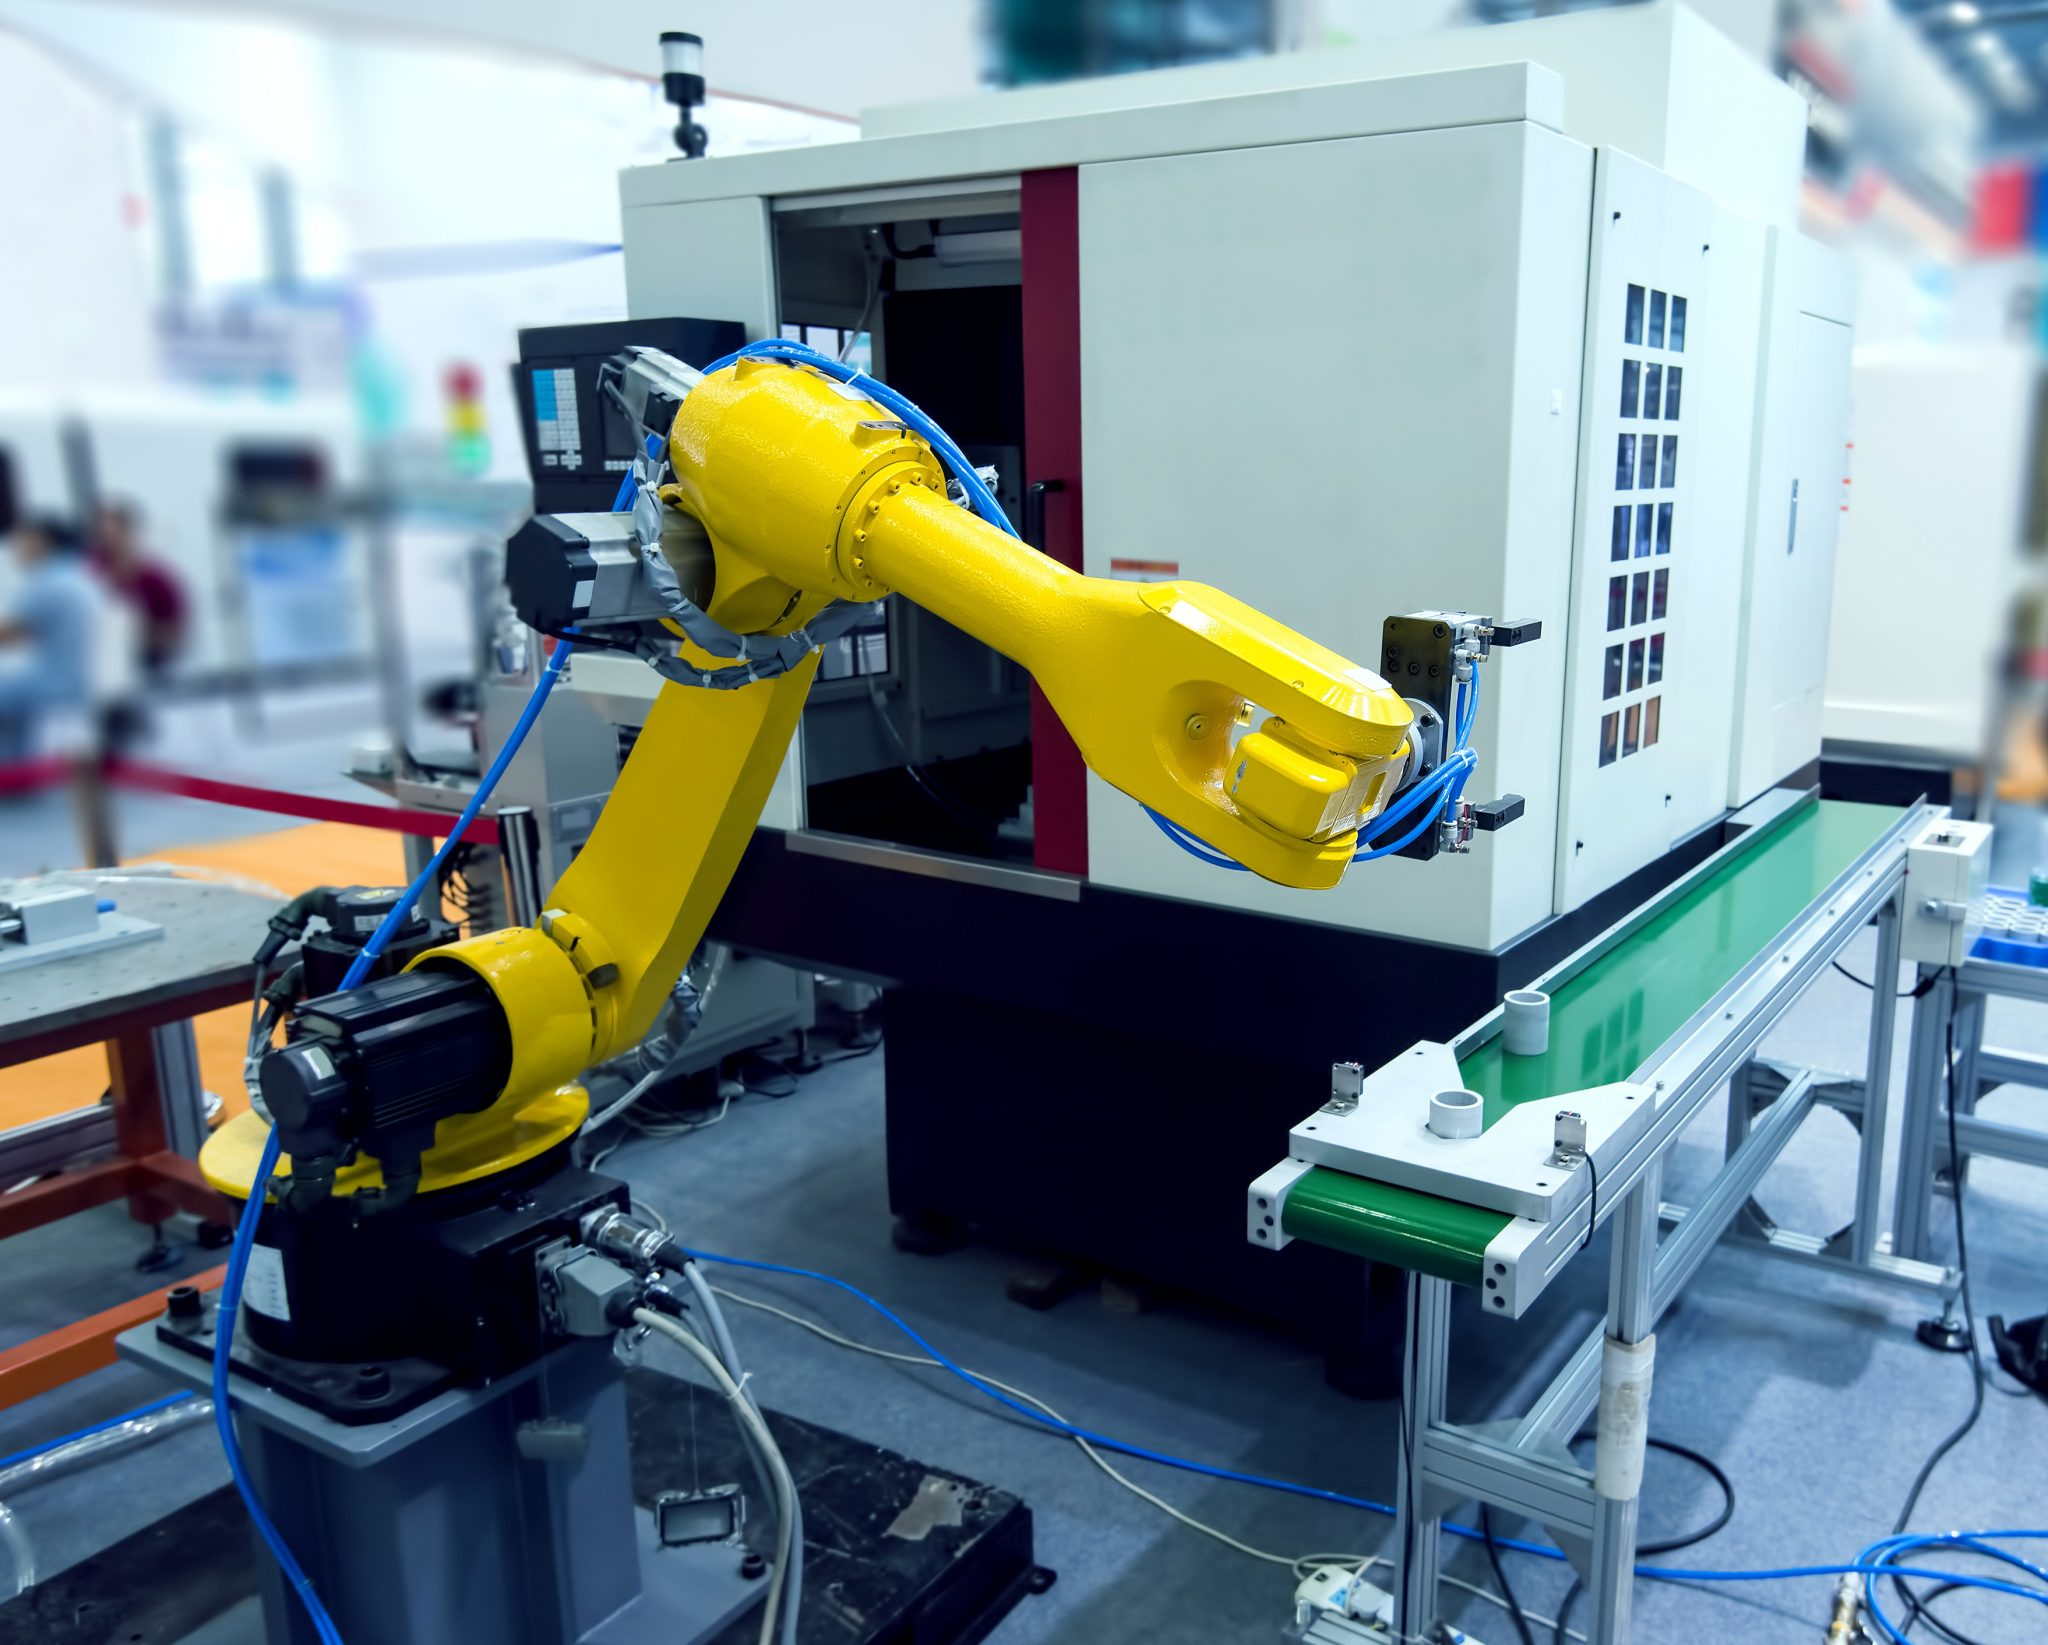 bigstock-robotic-hand-machine-tool-at-i-99370571